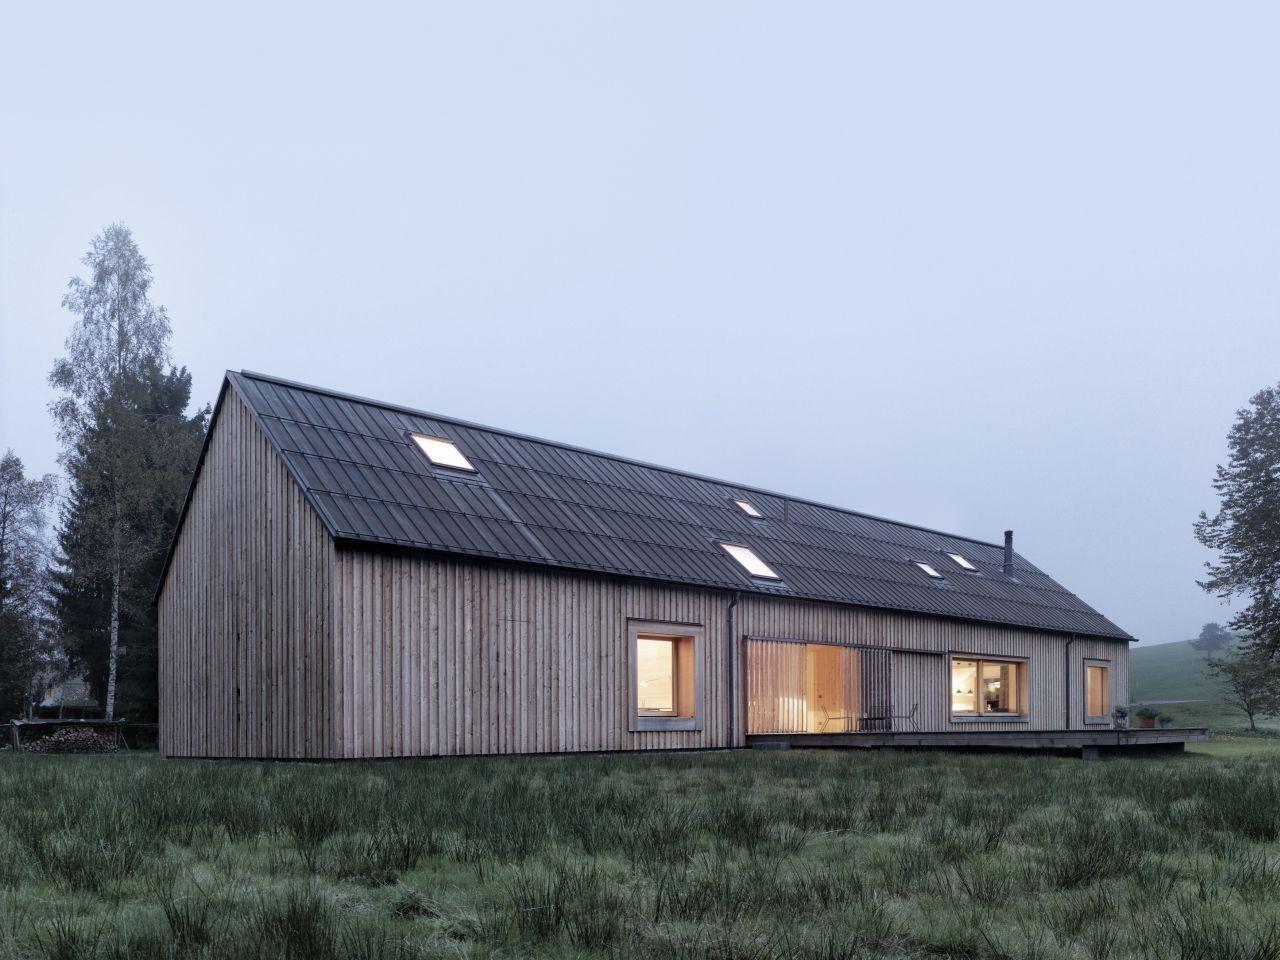 haus am moor bernardo bader architects archdaily. Black Bedroom Furniture Sets. Home Design Ideas